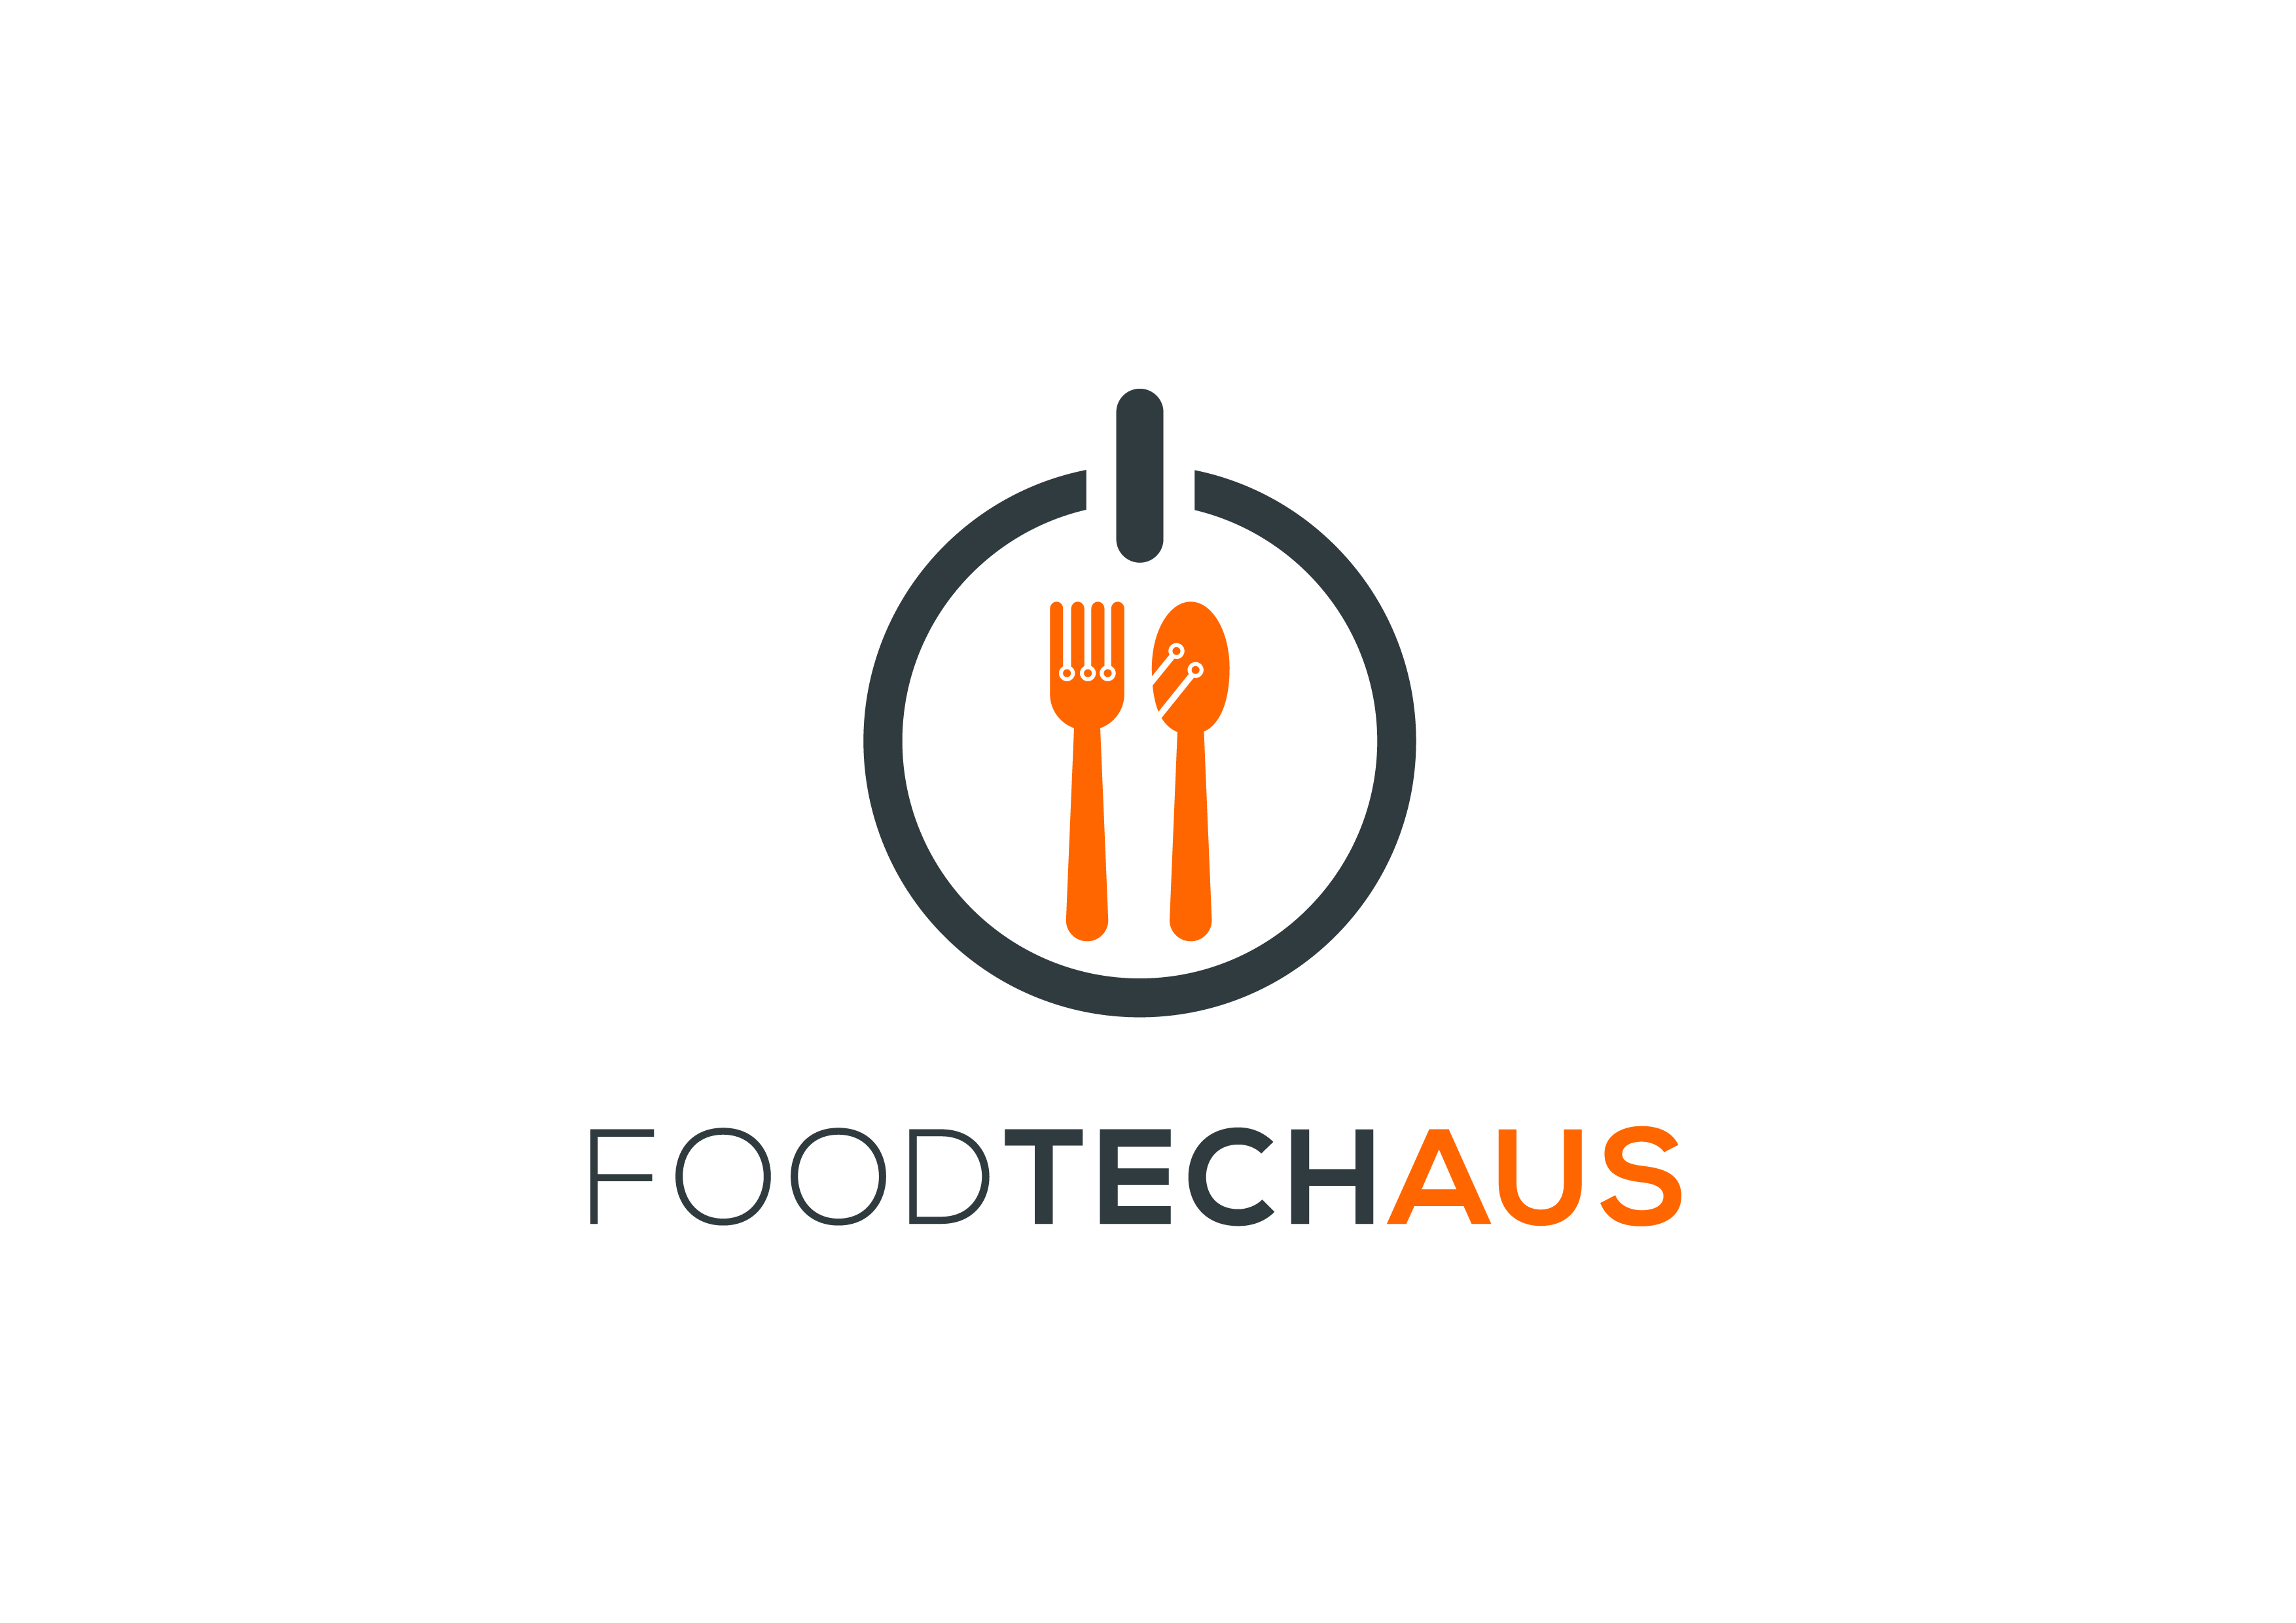 Food Tech Aus